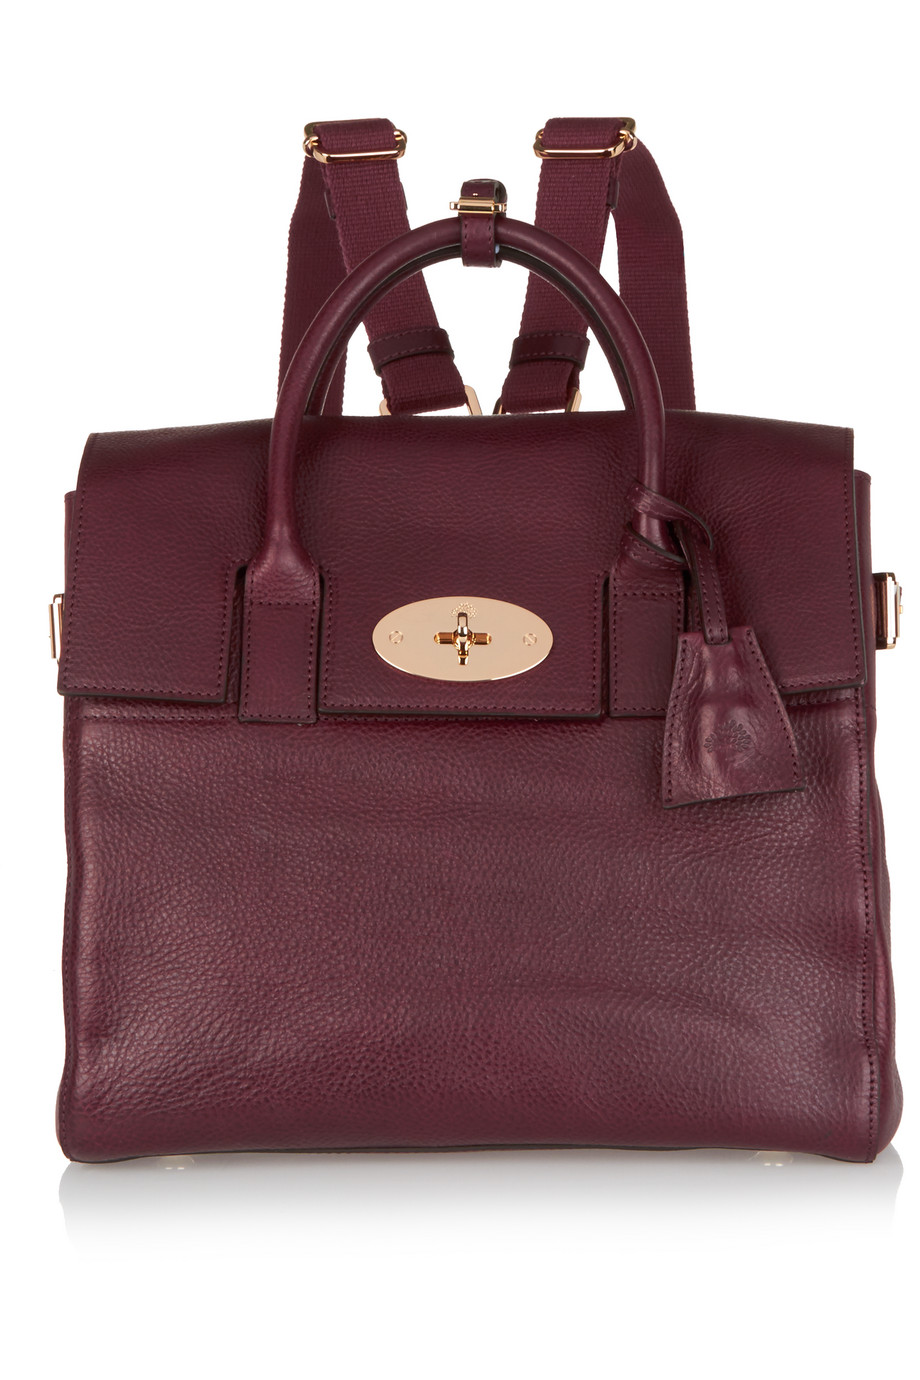 Mulberry + Cara Delevingne Medium Leather Backpack